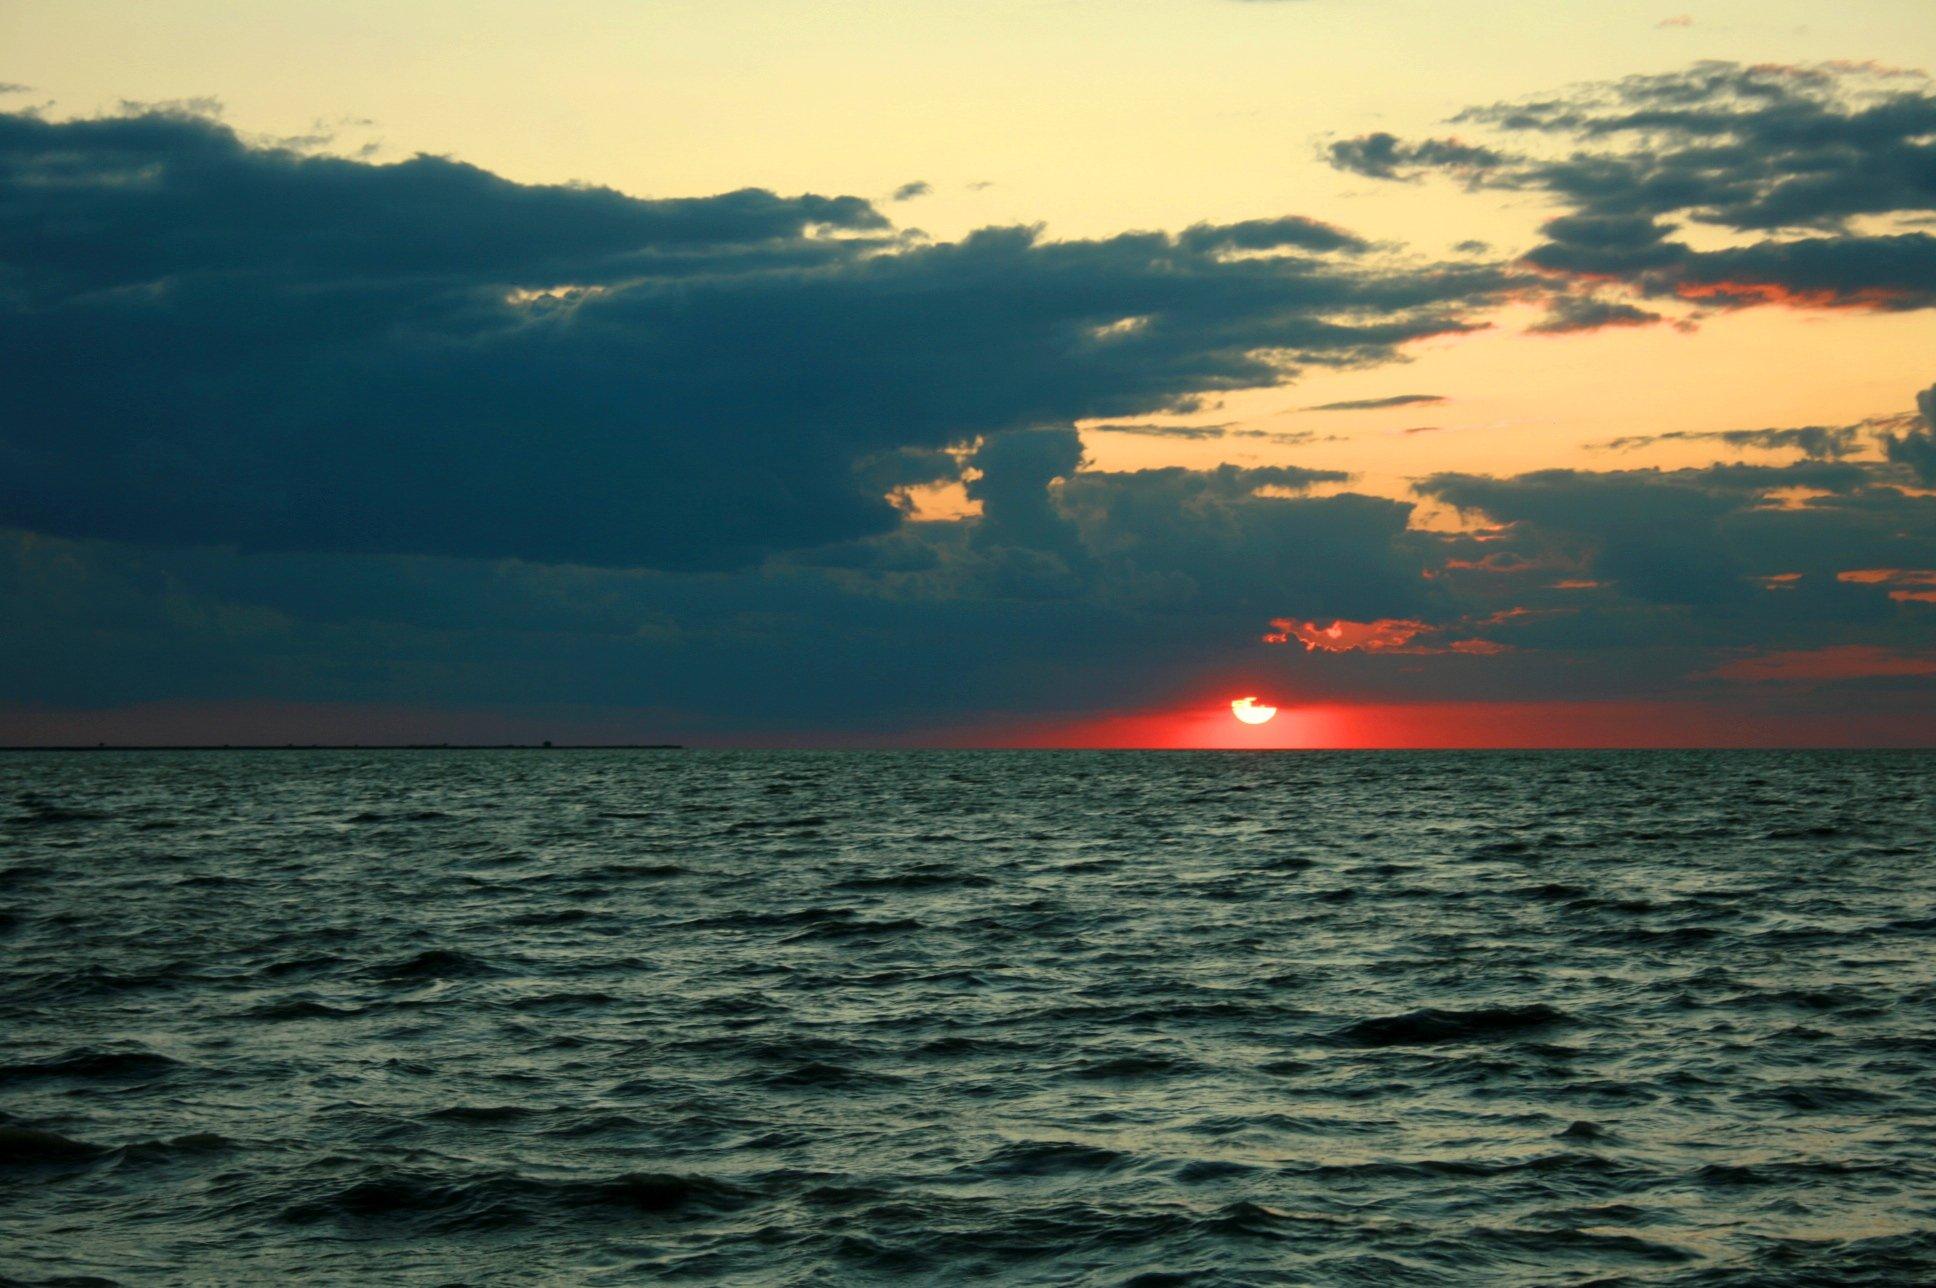 Закаты на черном море фото